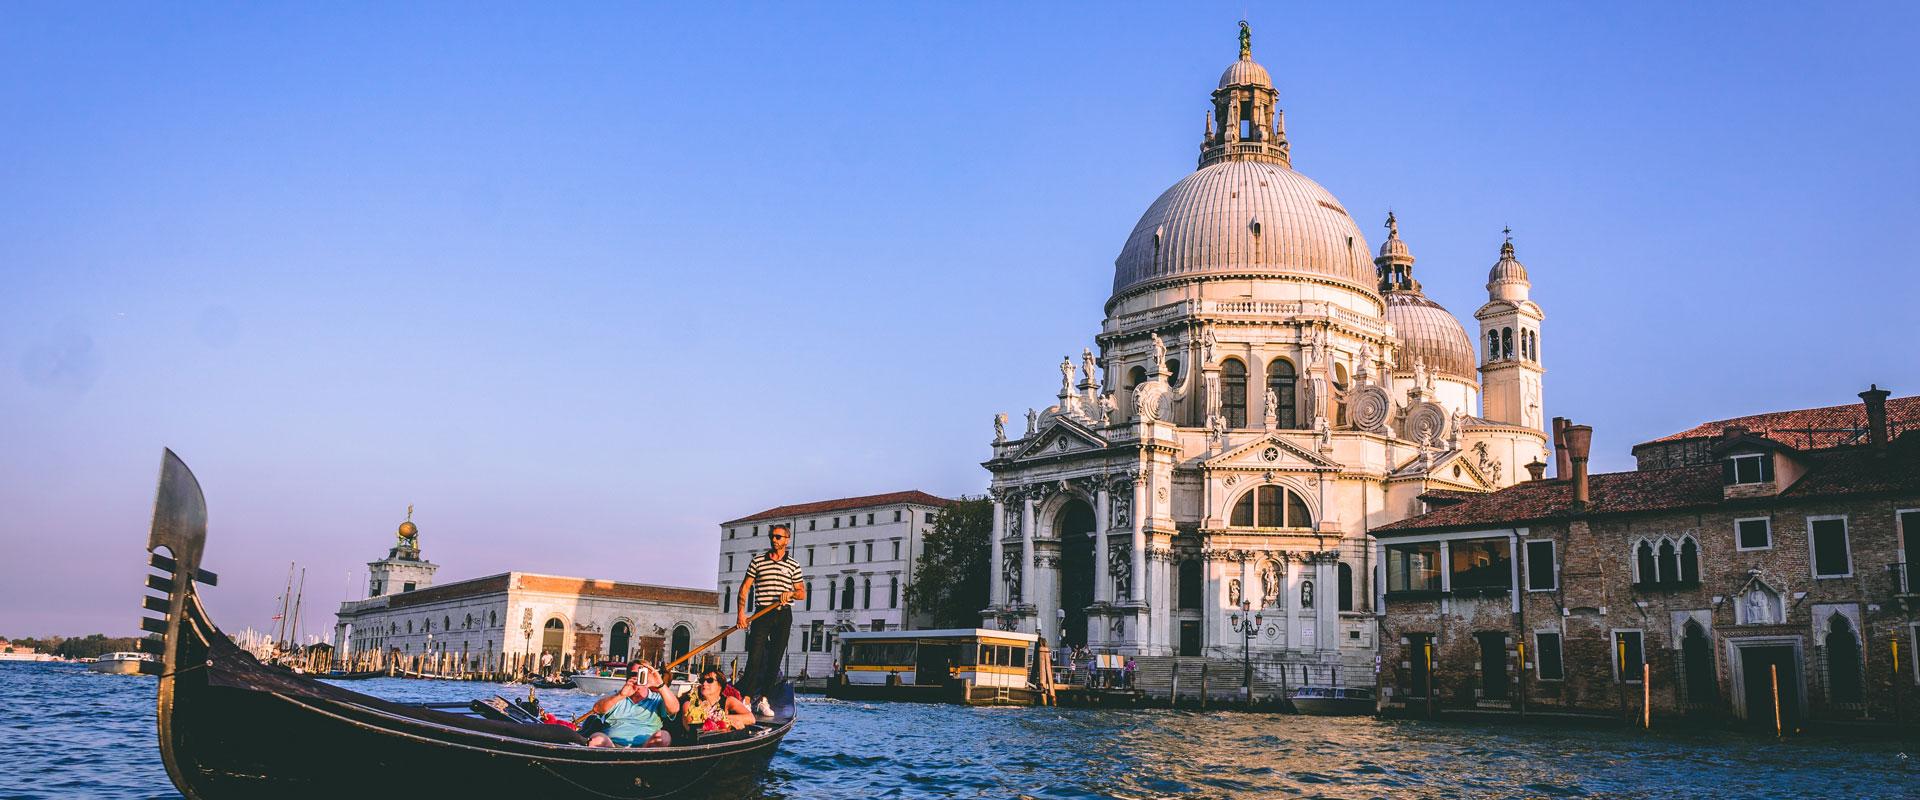 Voyages en europe avec Via Nostra